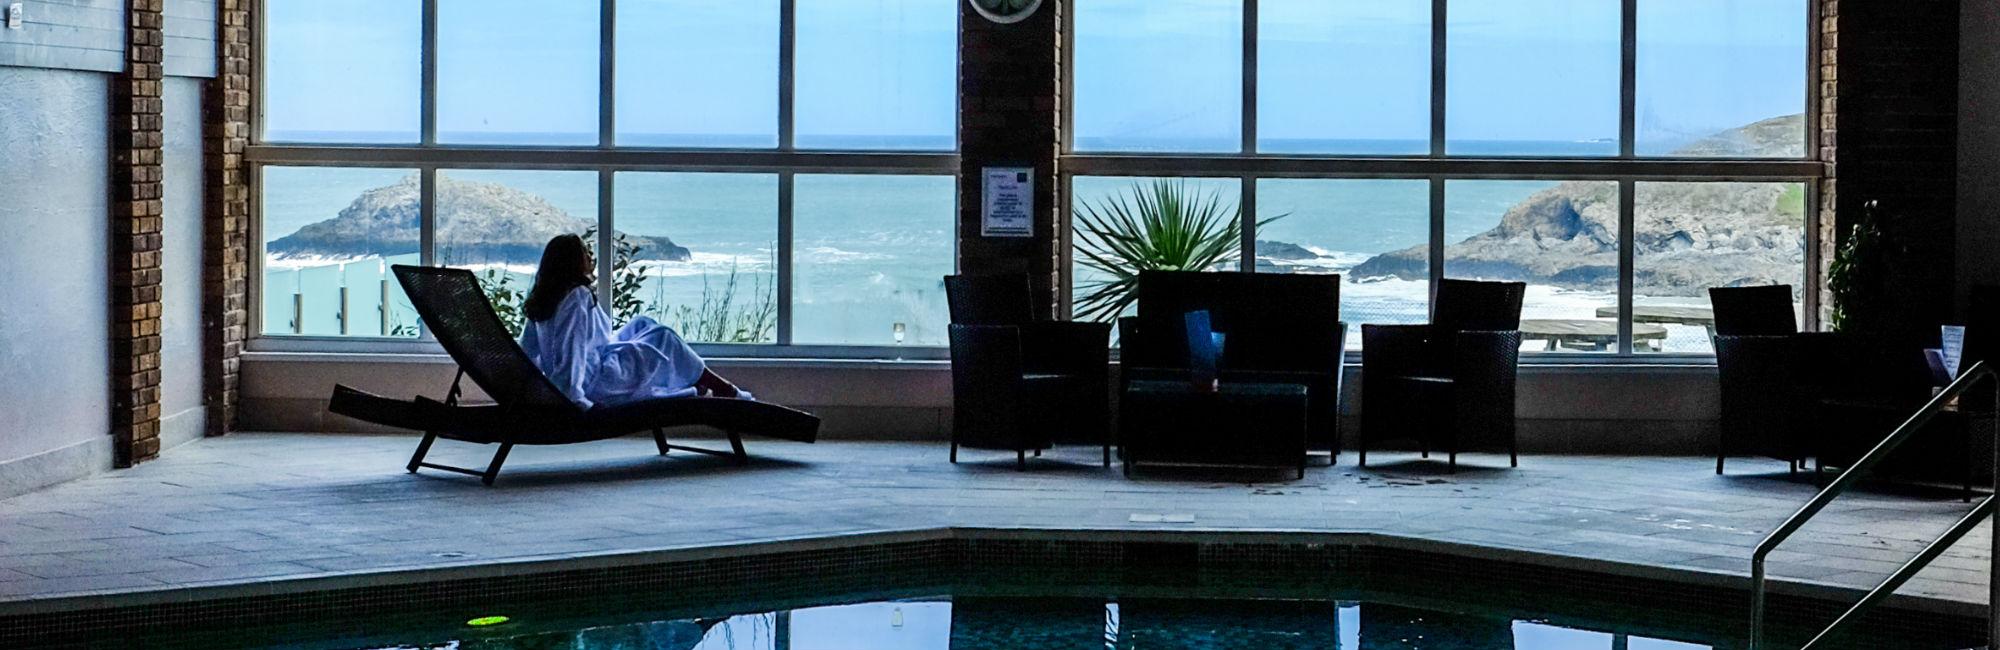 Swimming pool - Spa Treatments